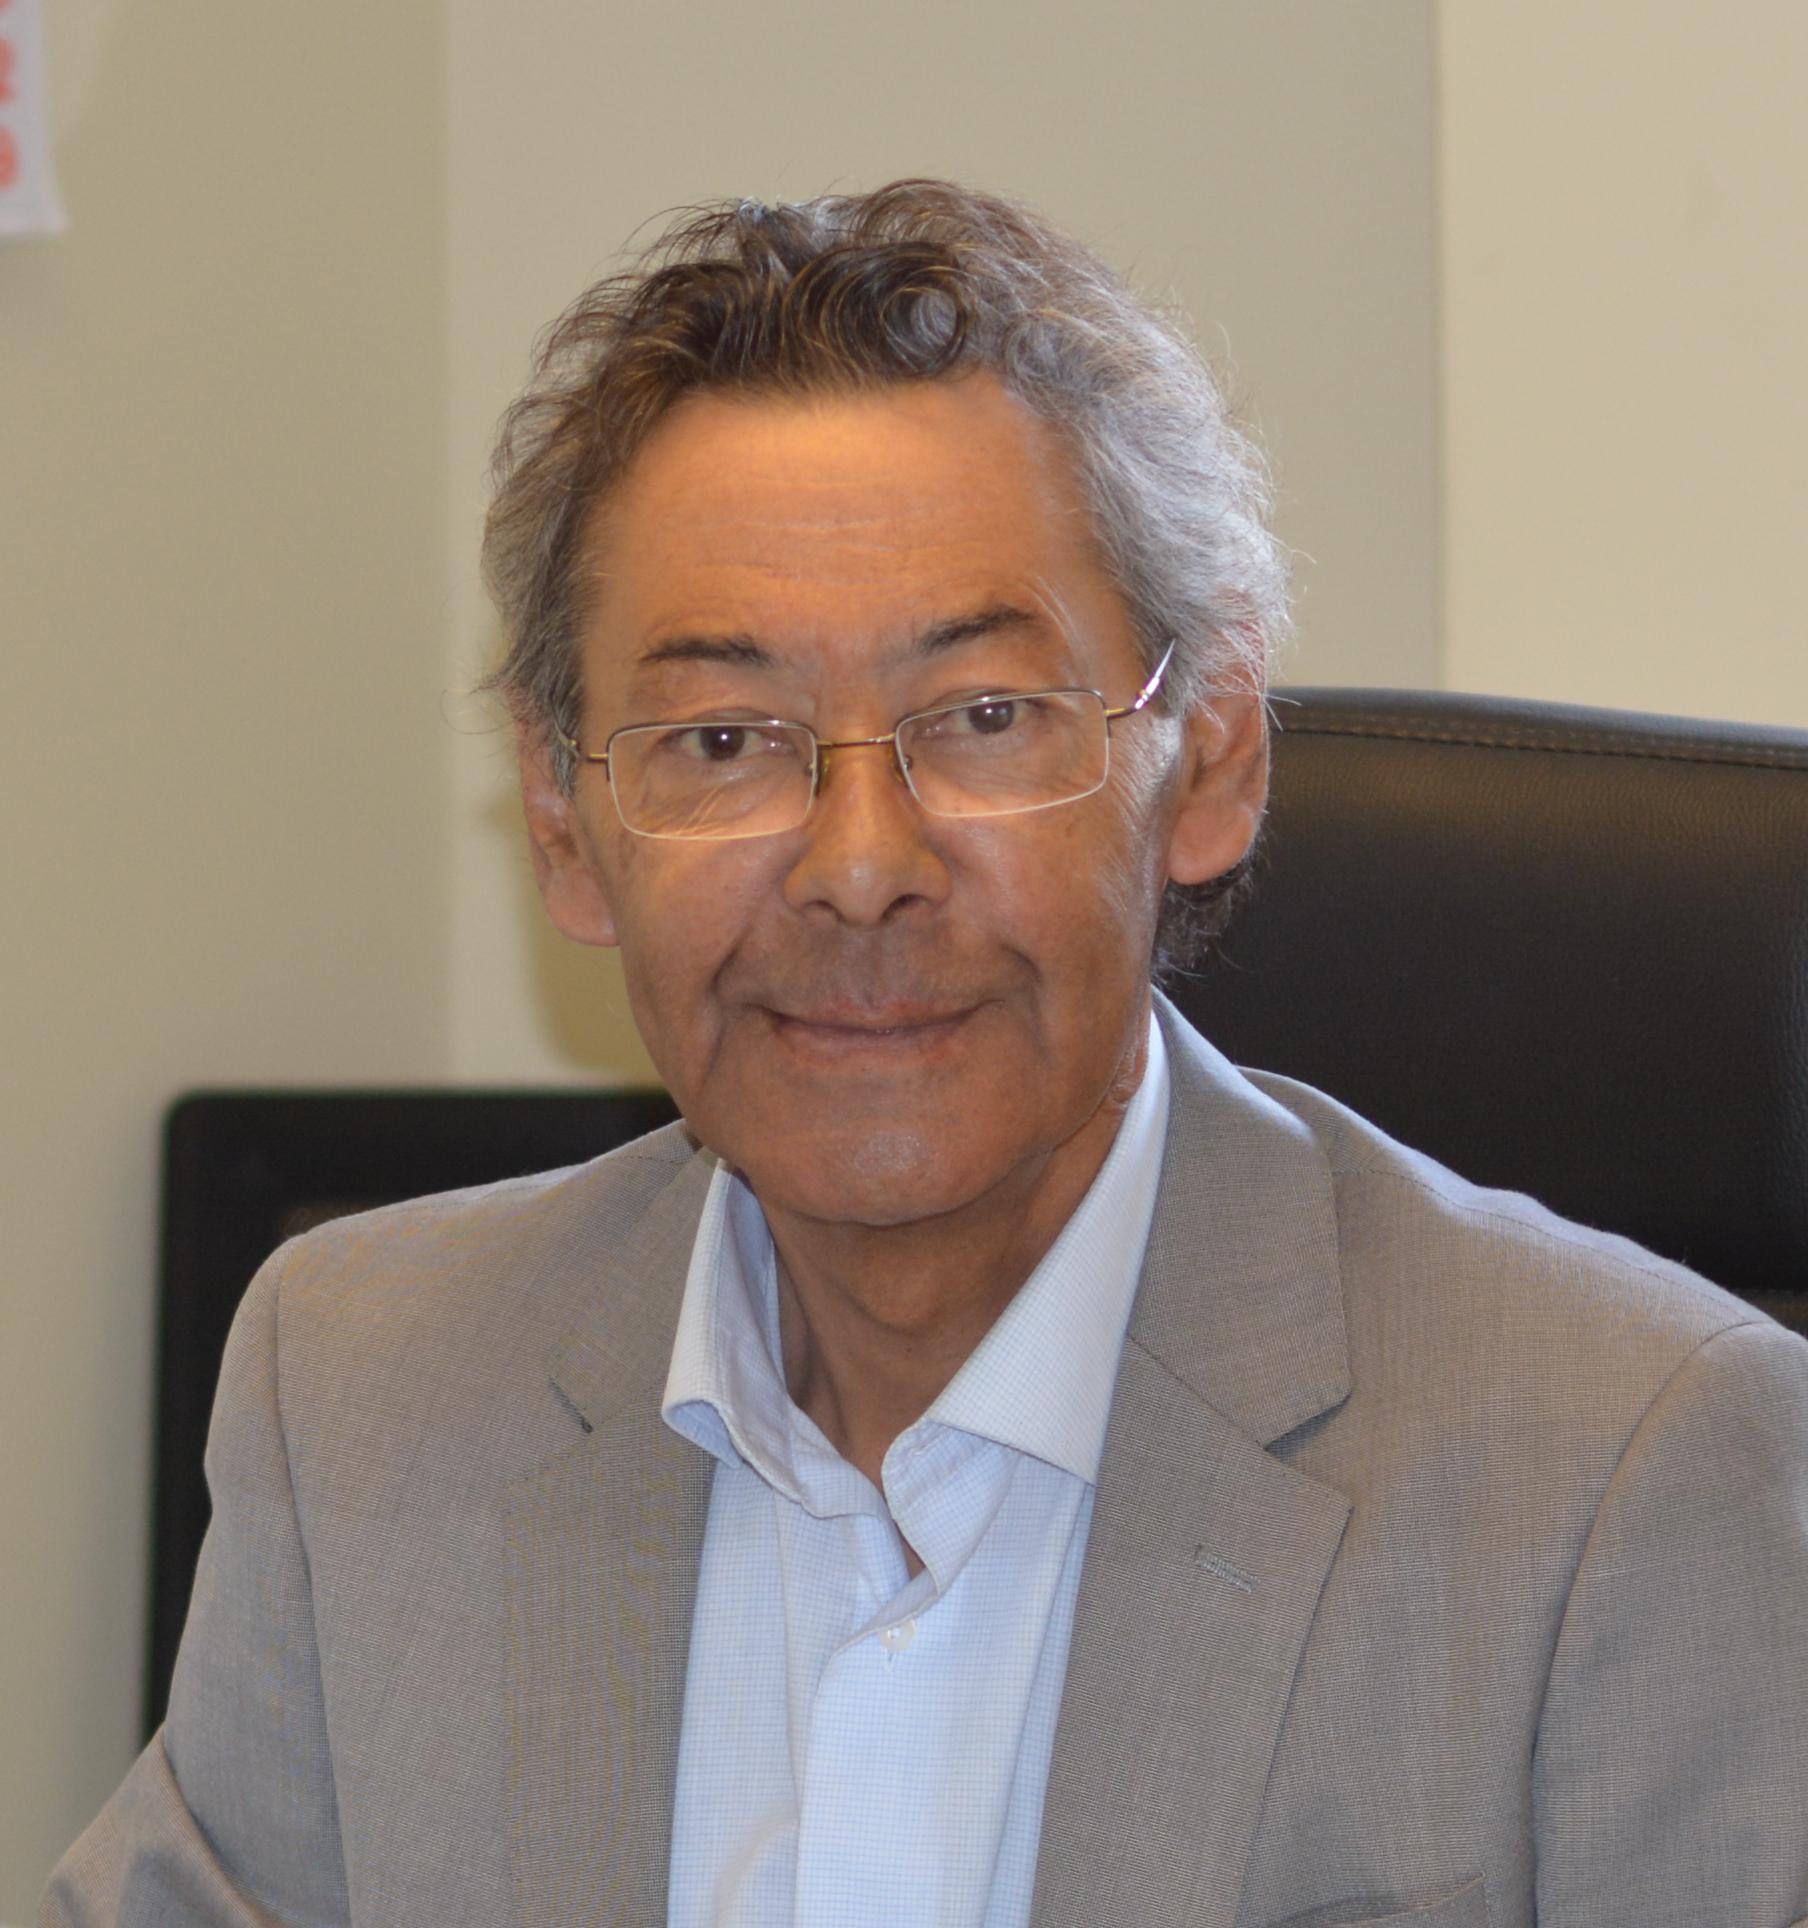 Jaime Fernández Celis